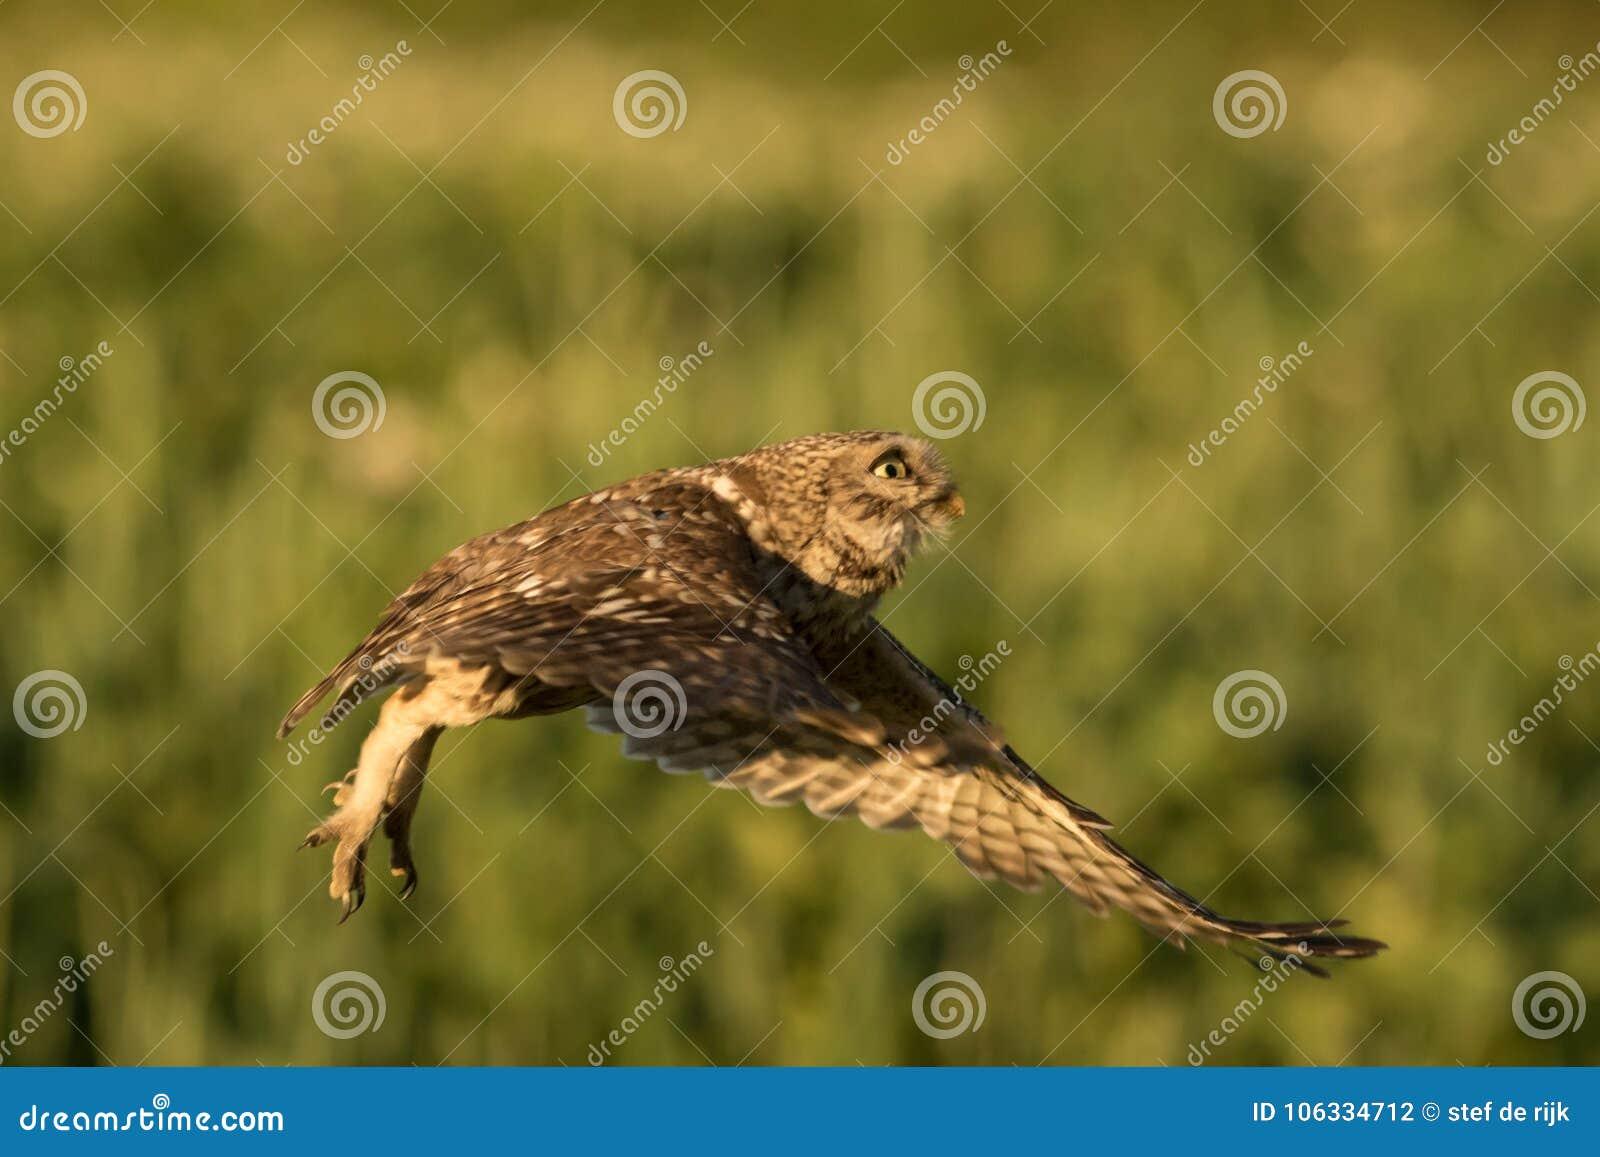 Little owl taking off